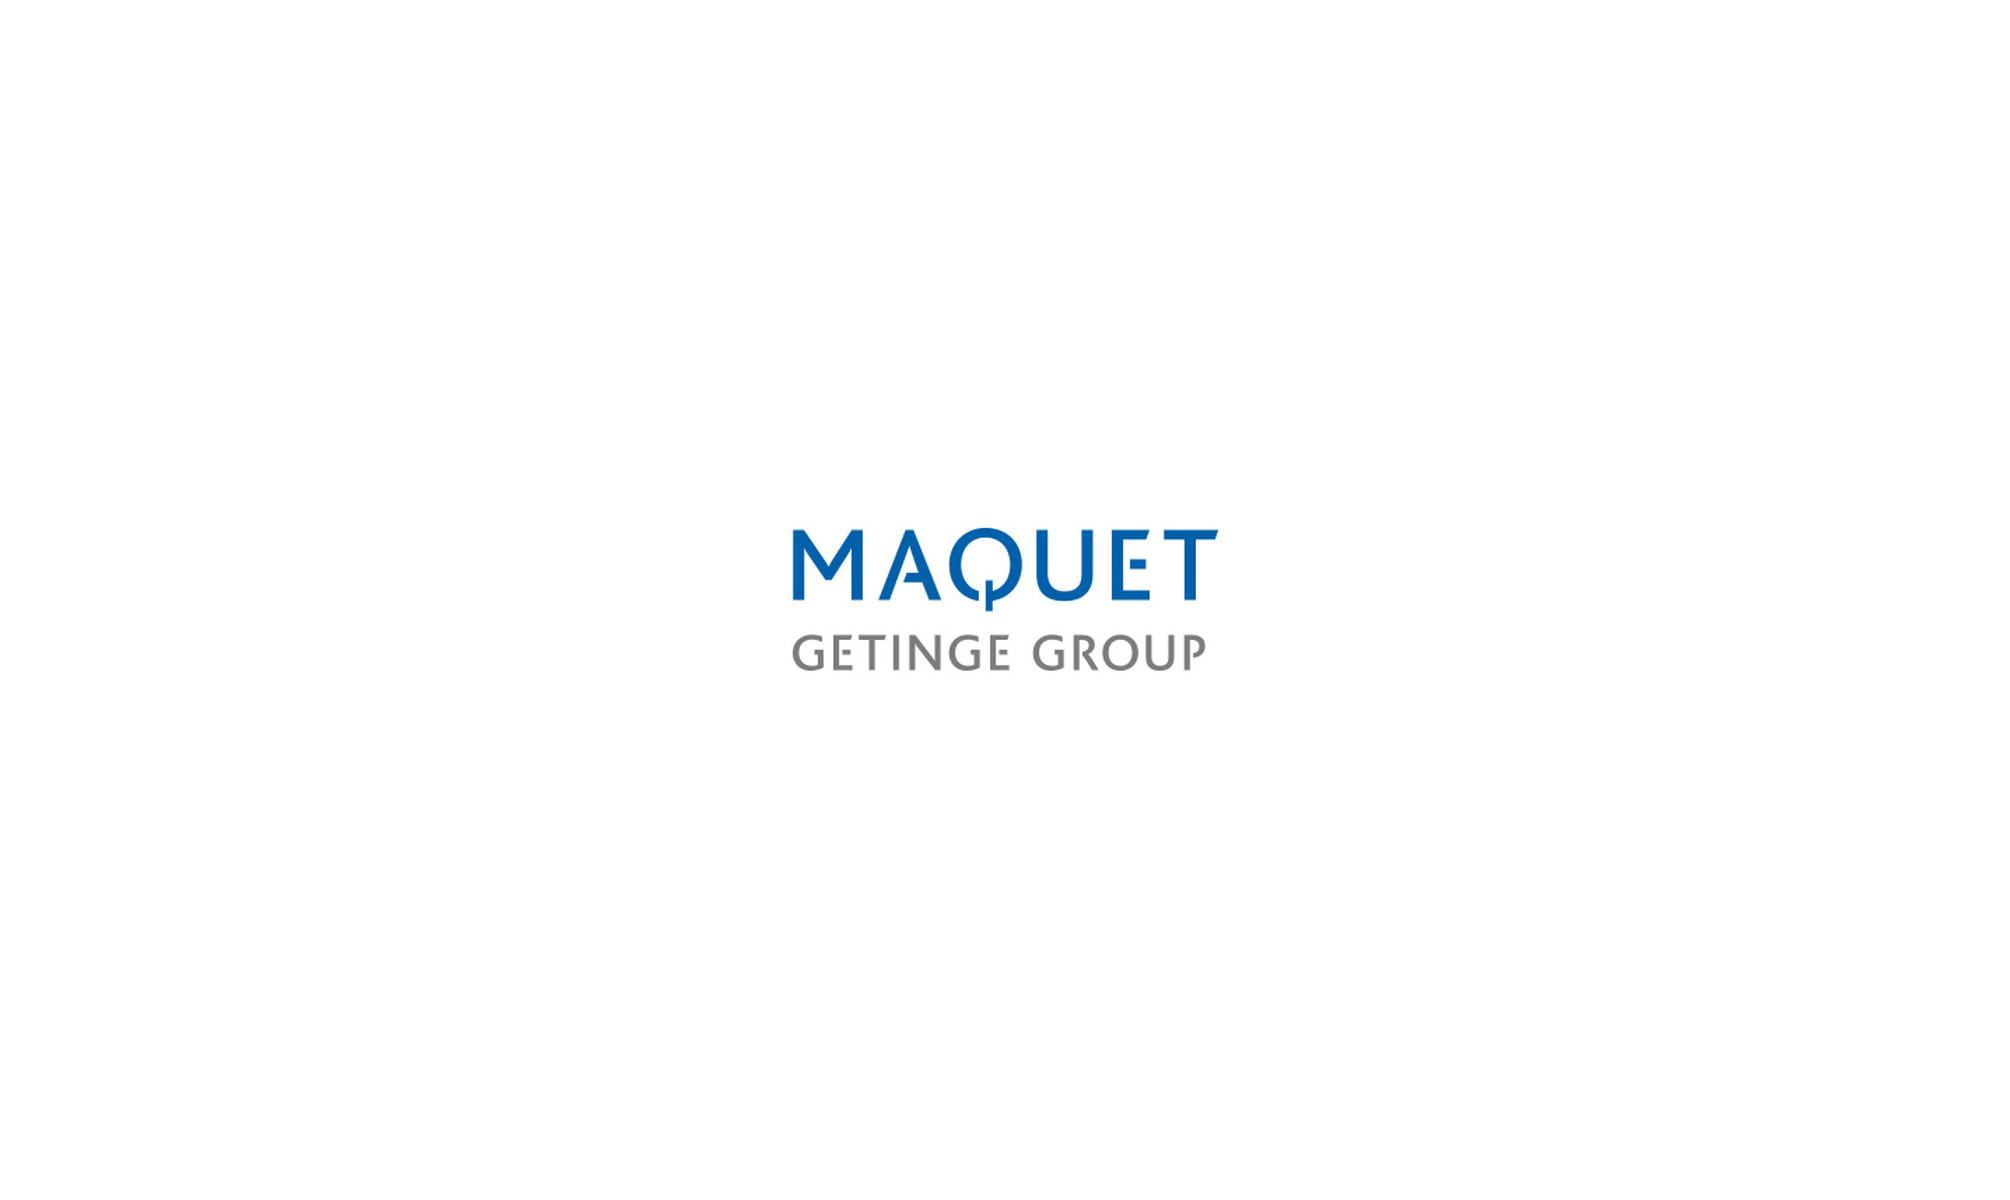 Maquet